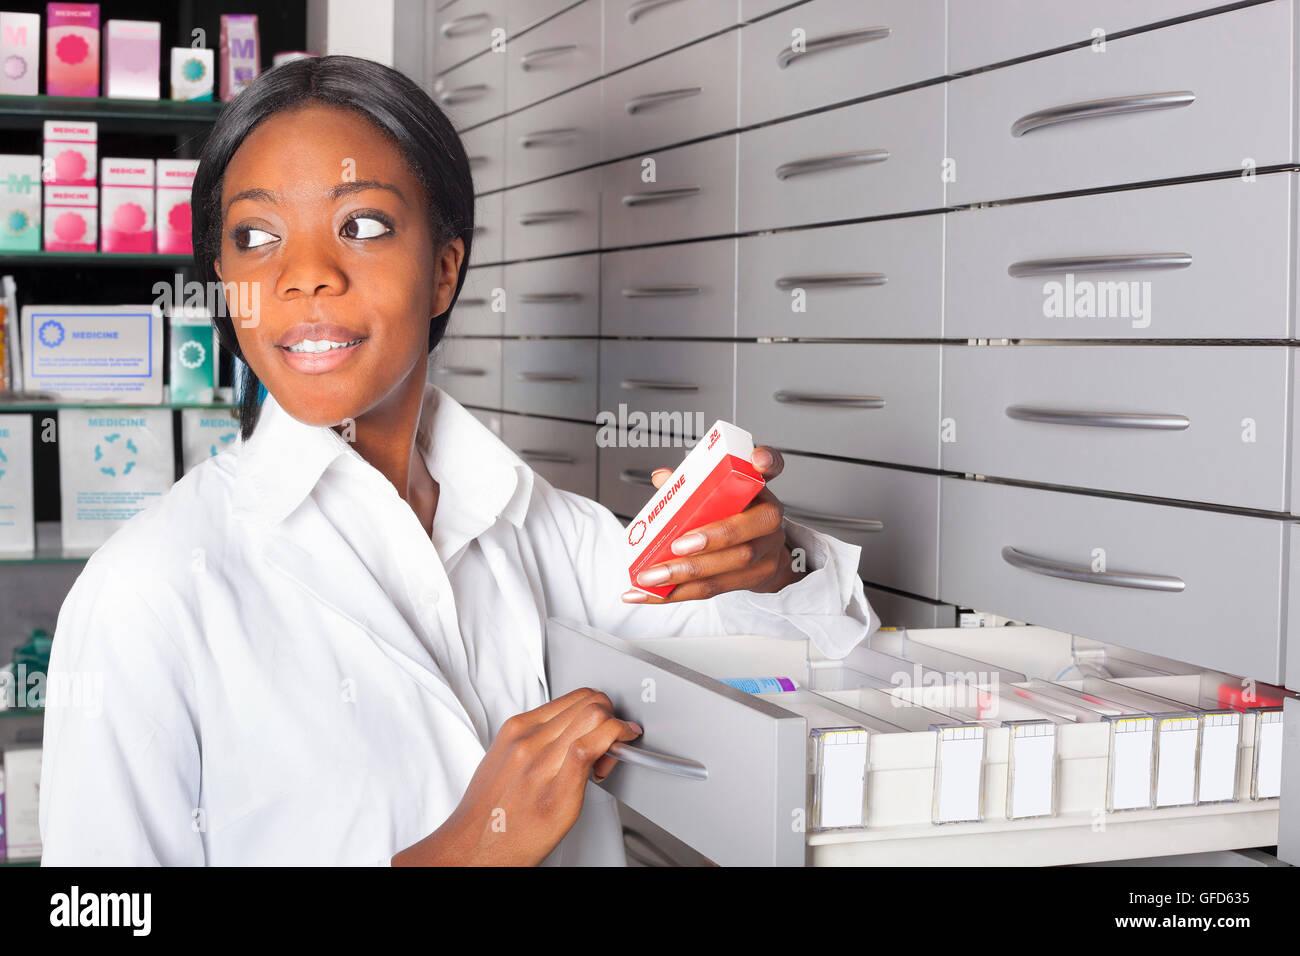 Woman Pharmacy Cashier Stock Photos Woman Pharmacy Cashier Stock